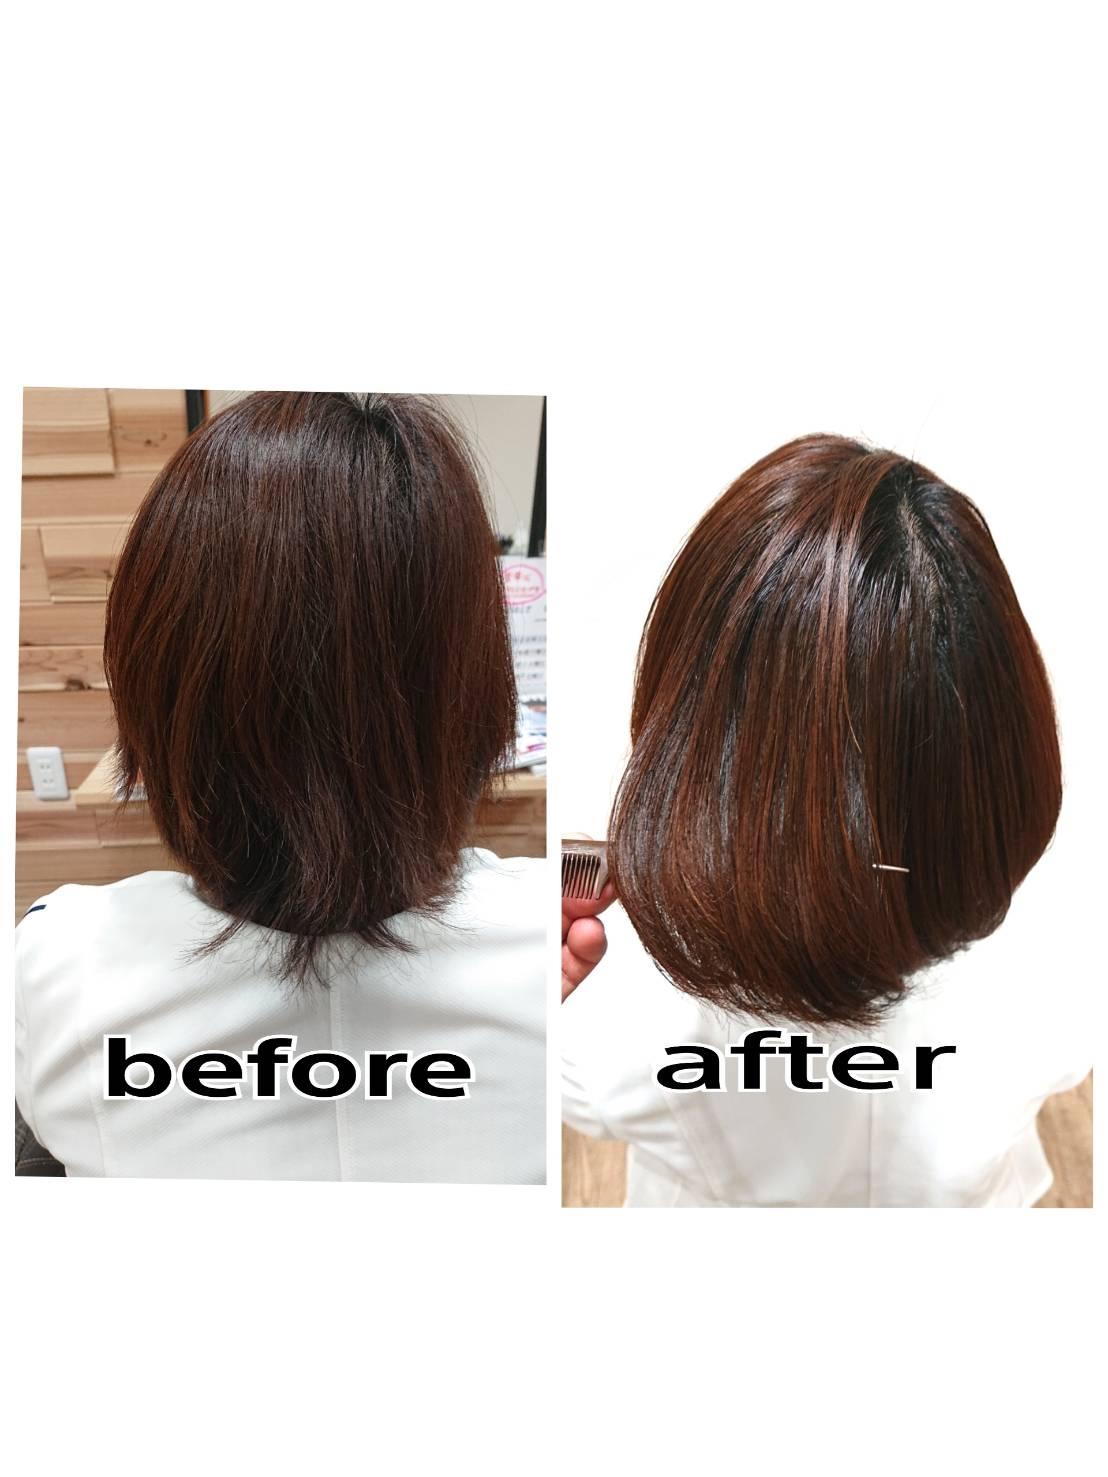 hair mily (ヘアミリー)@2_e0292546_07460129.jpg